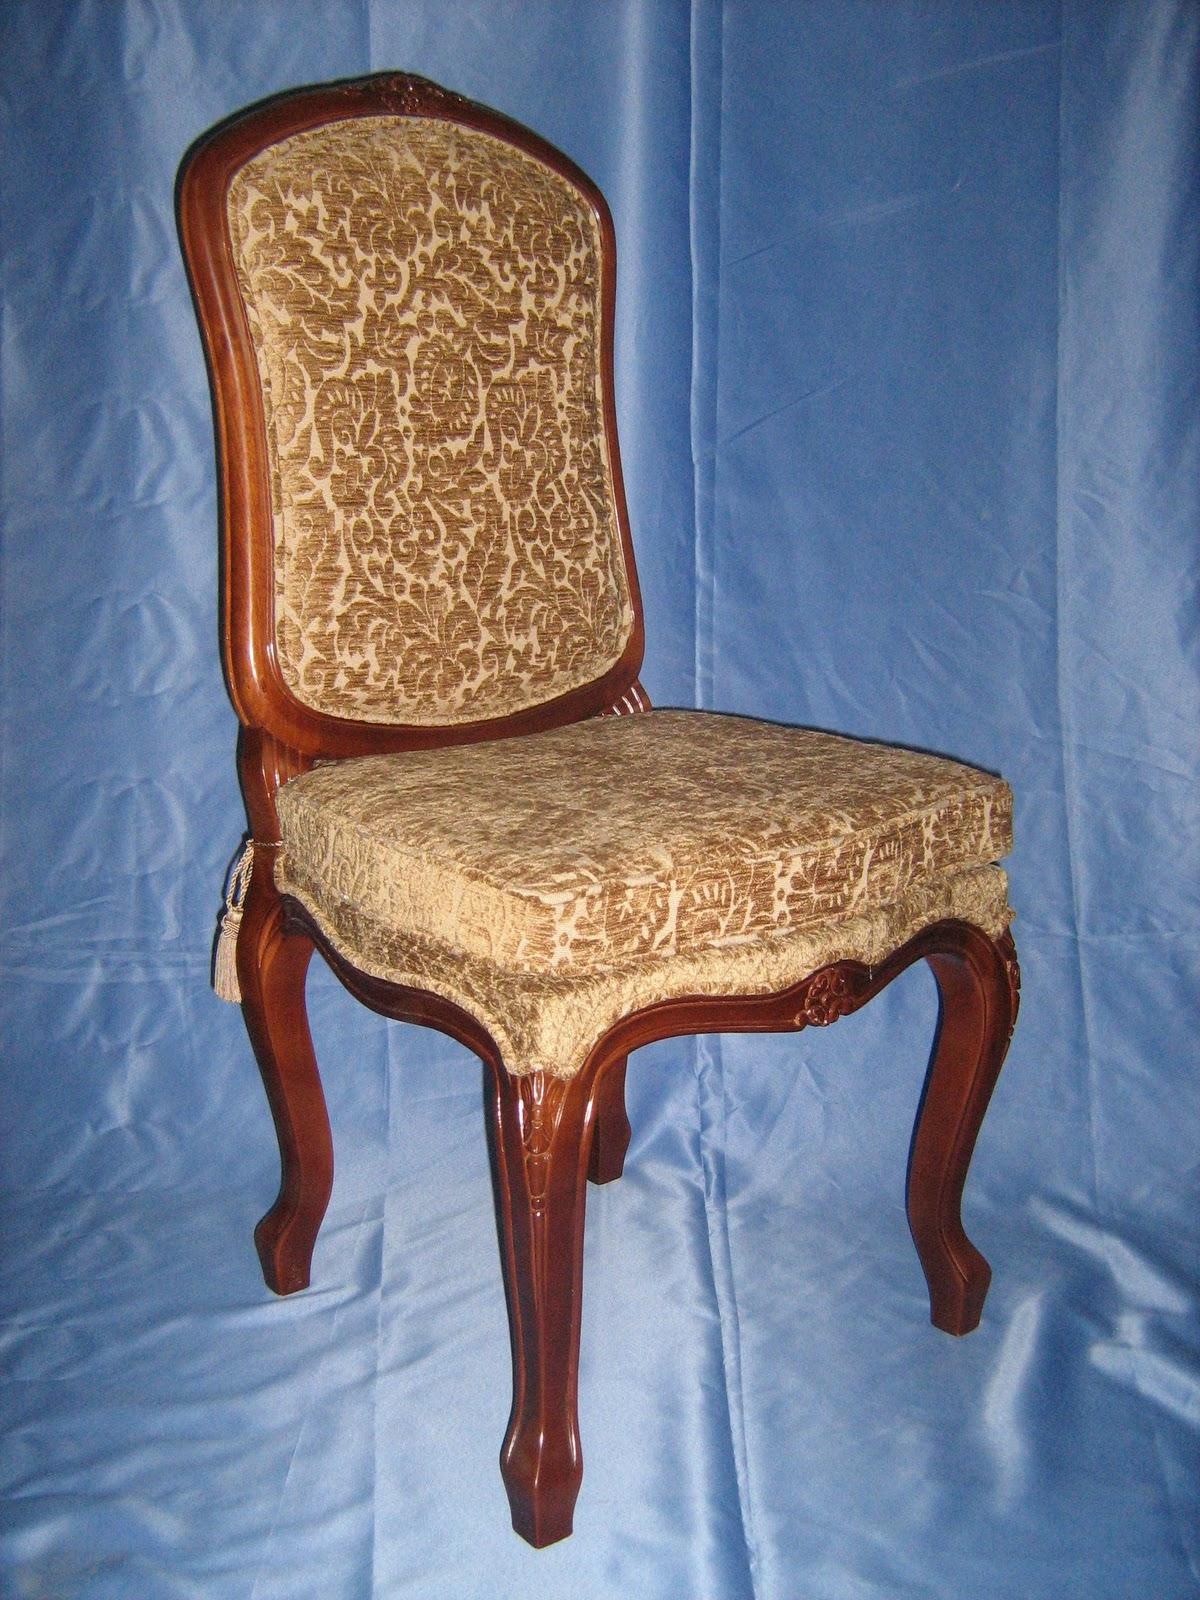 Cadeira e Mesa: Cadeiras de Madeira Antigas #713626 1200x1600